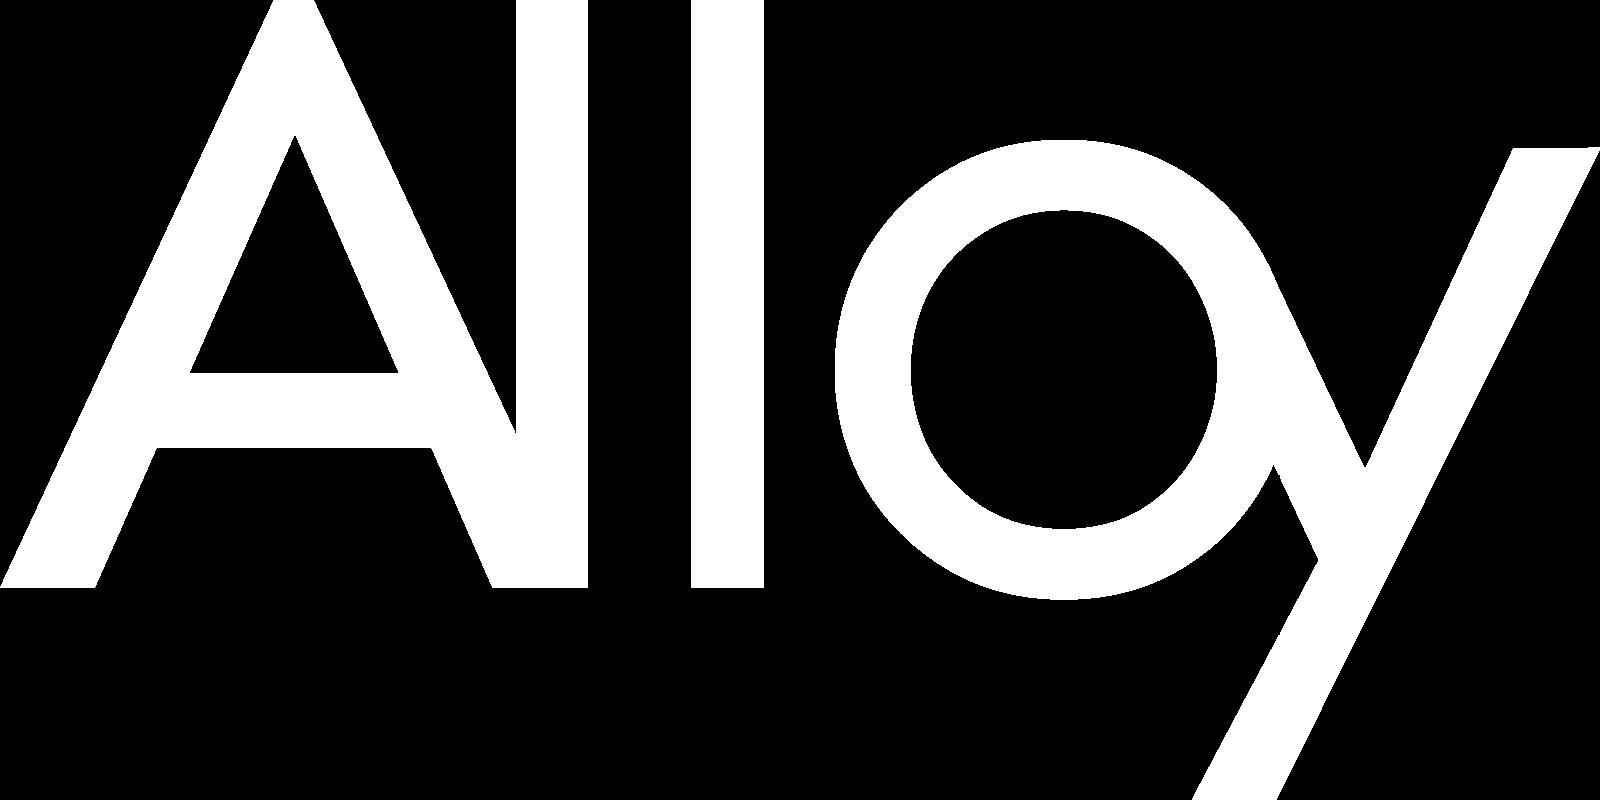 Alloy Merge Brand Name